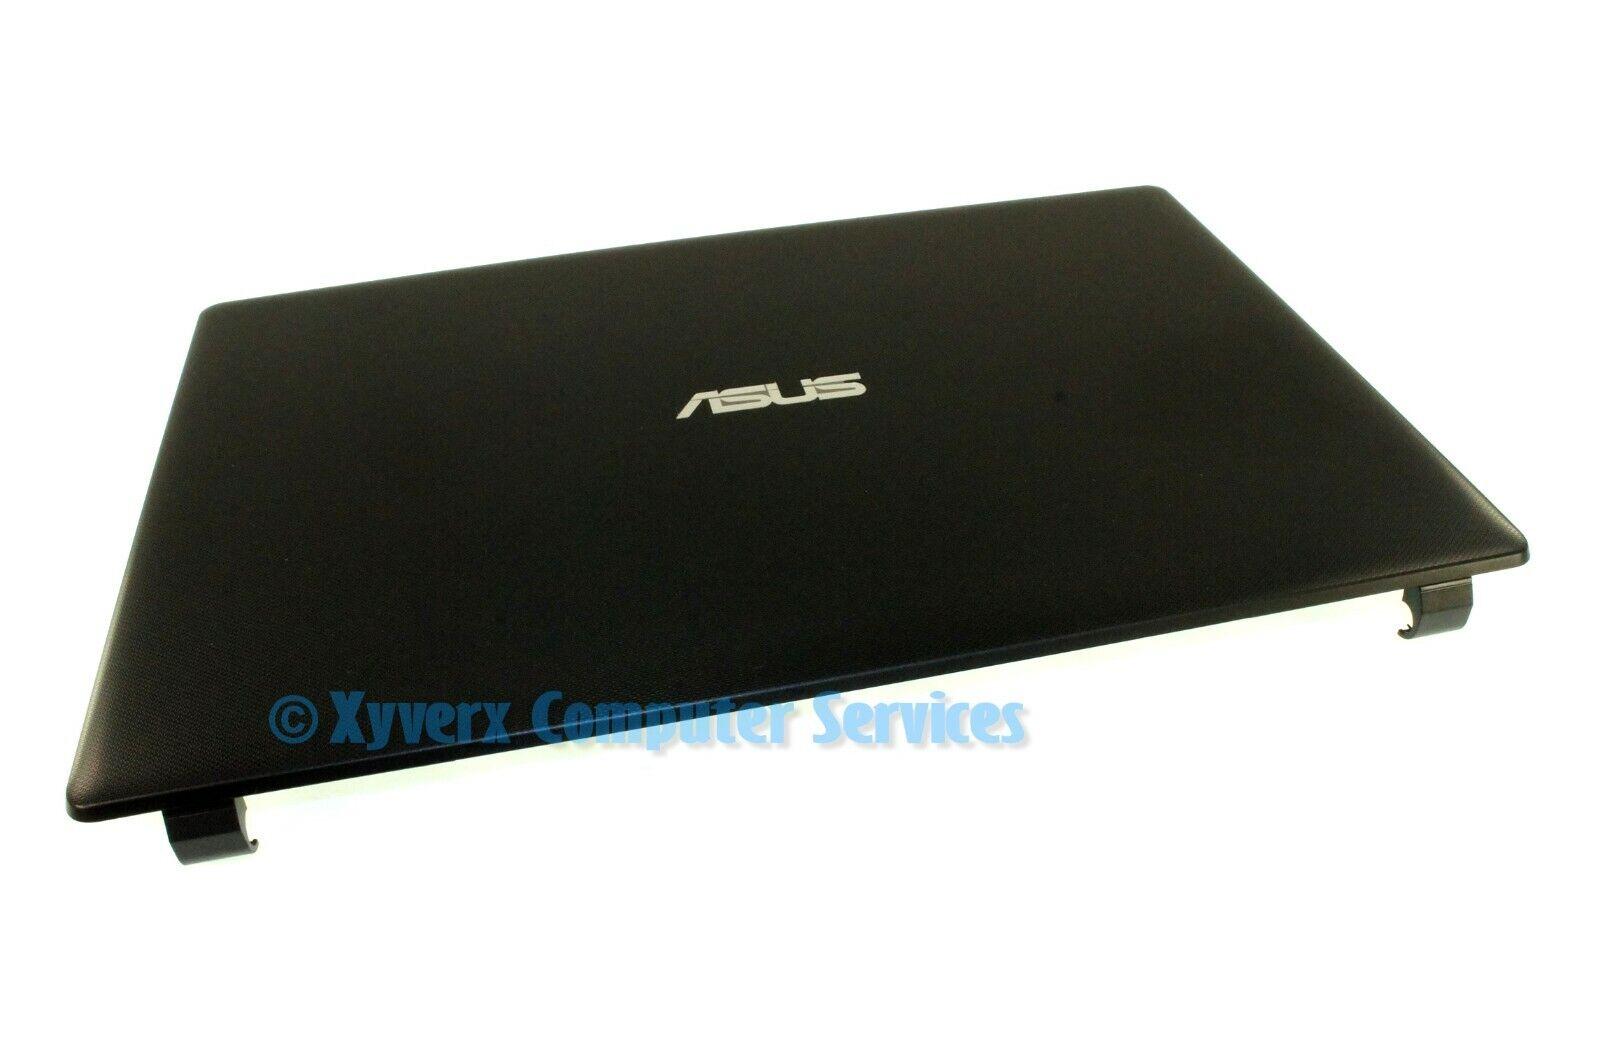 13NB0341AP0141 GENUINE ASUS LCD DISPLAY BACK COVER X551M GRD C FC32  - $17.99